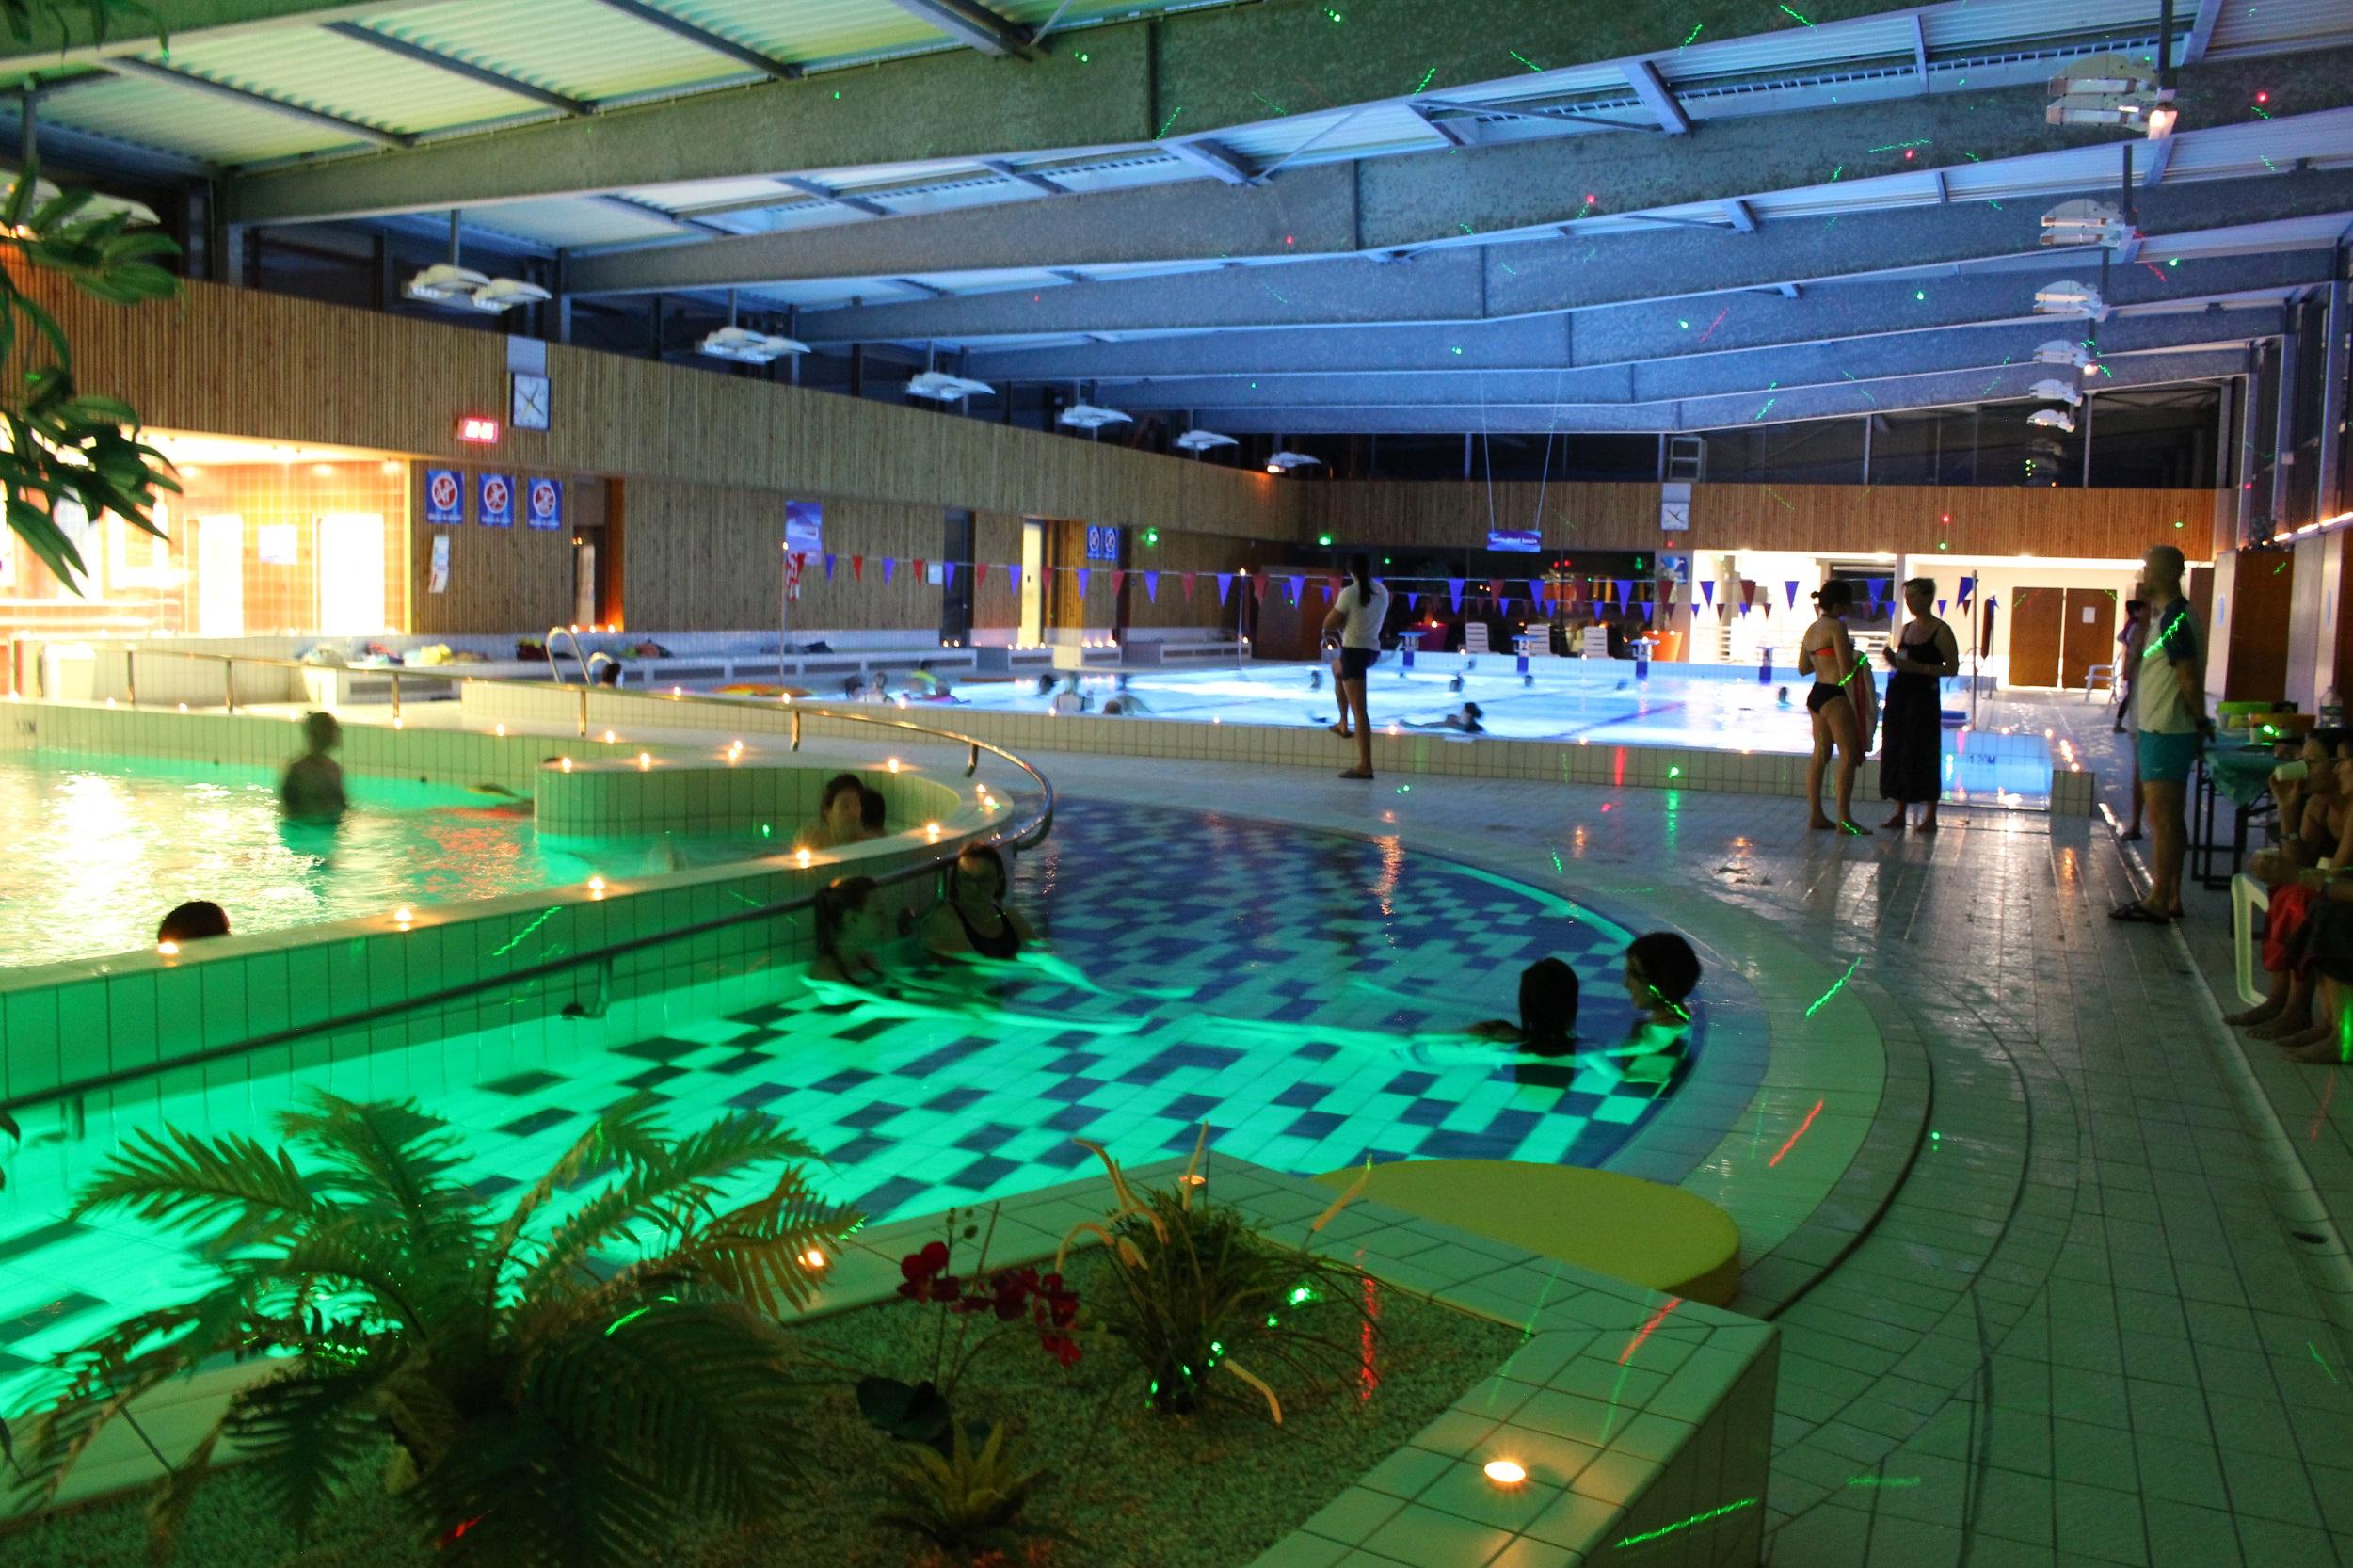 Complexe Aquatique De Kerbihan - Hennebont tout Horaire Piscine Lorient